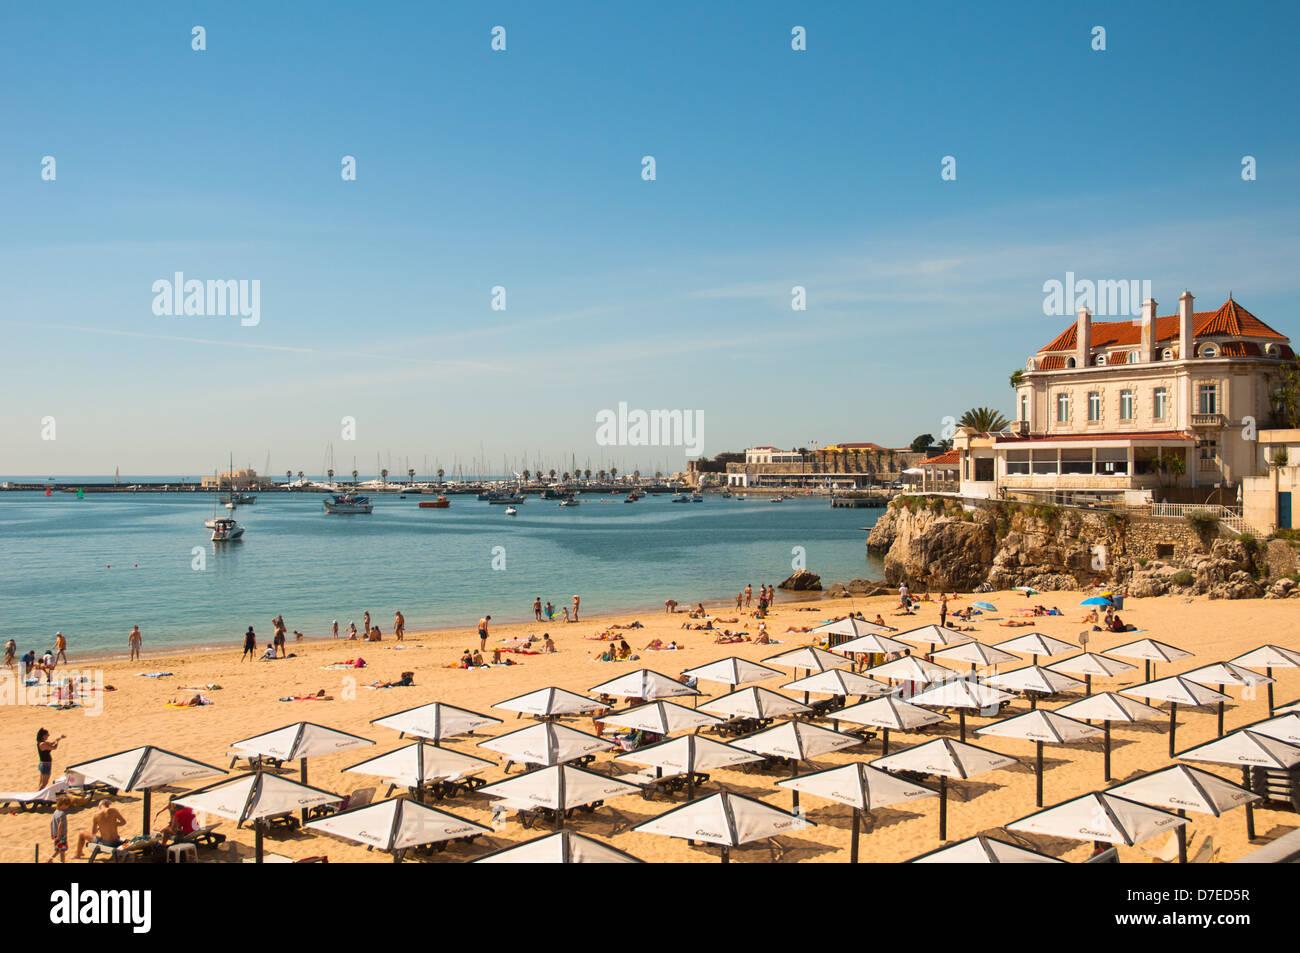 Sun umbrellas and beach - Stock Image